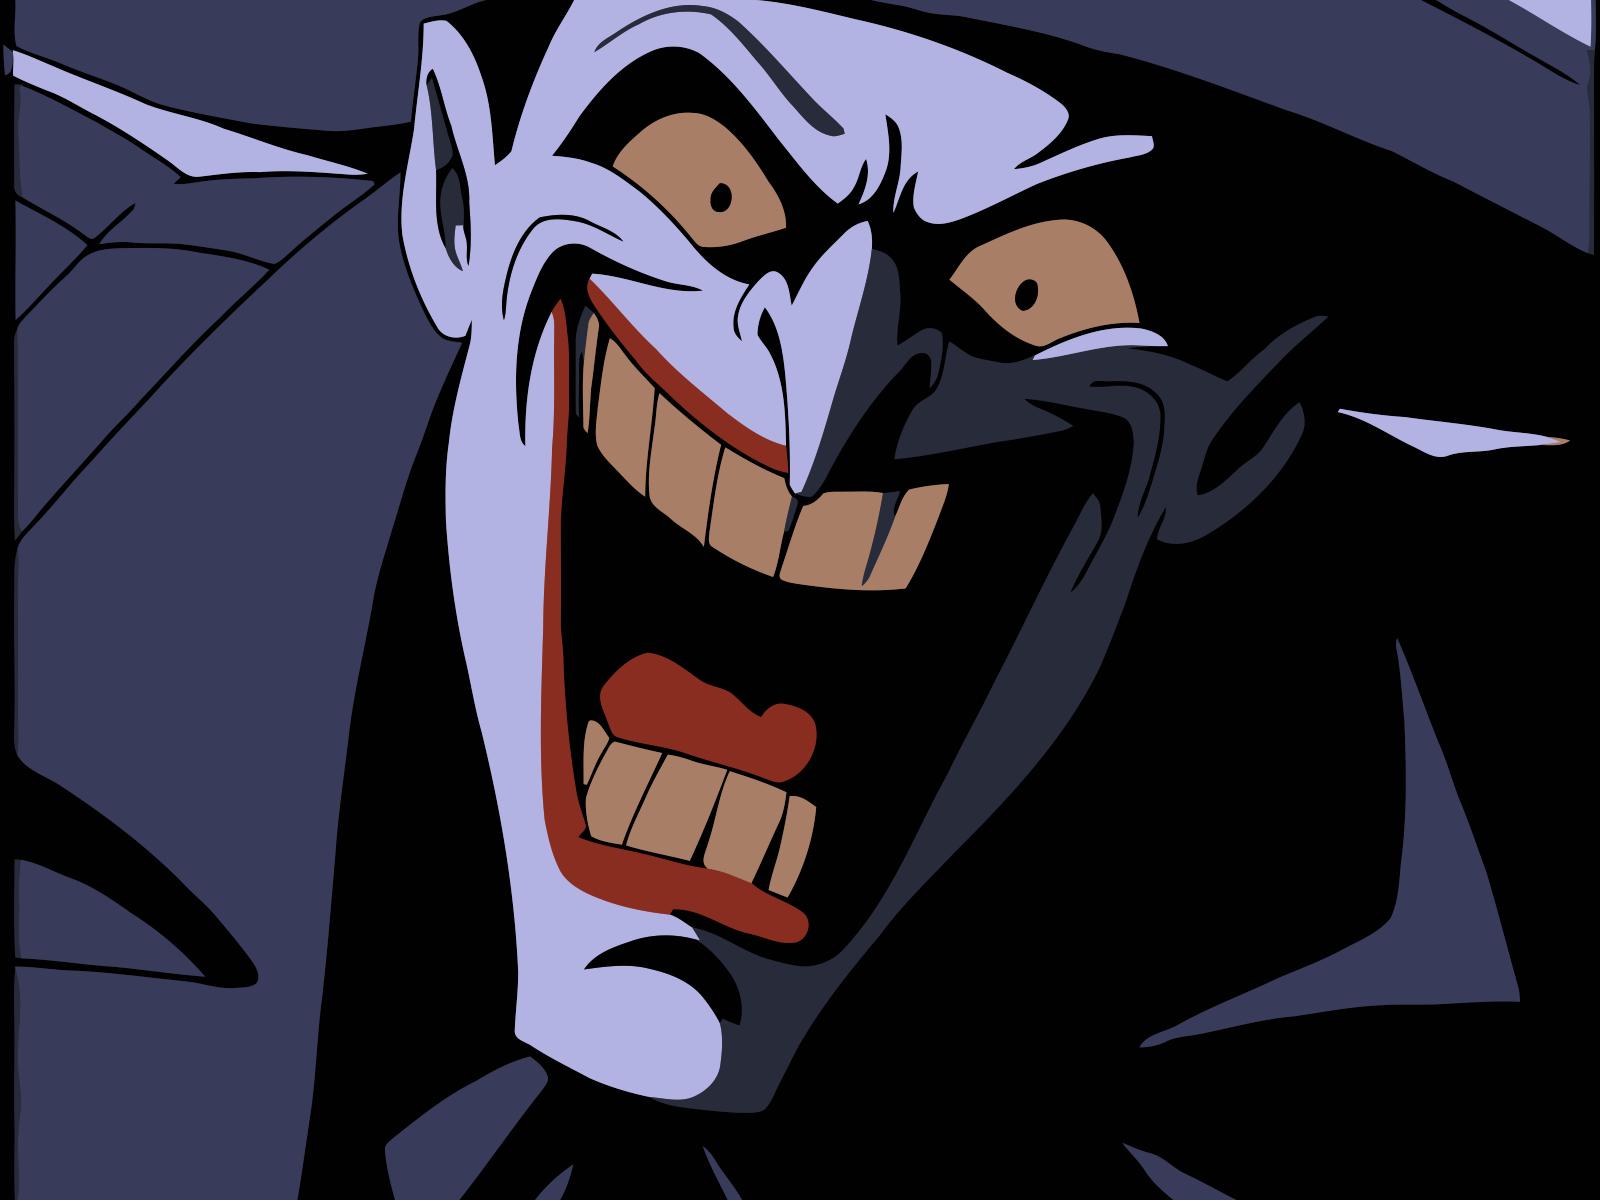 Wonderful Wallpaper Halloween Joker - batman_the_animated_series_the_joker_wallpaper-7952  2018_956387.png